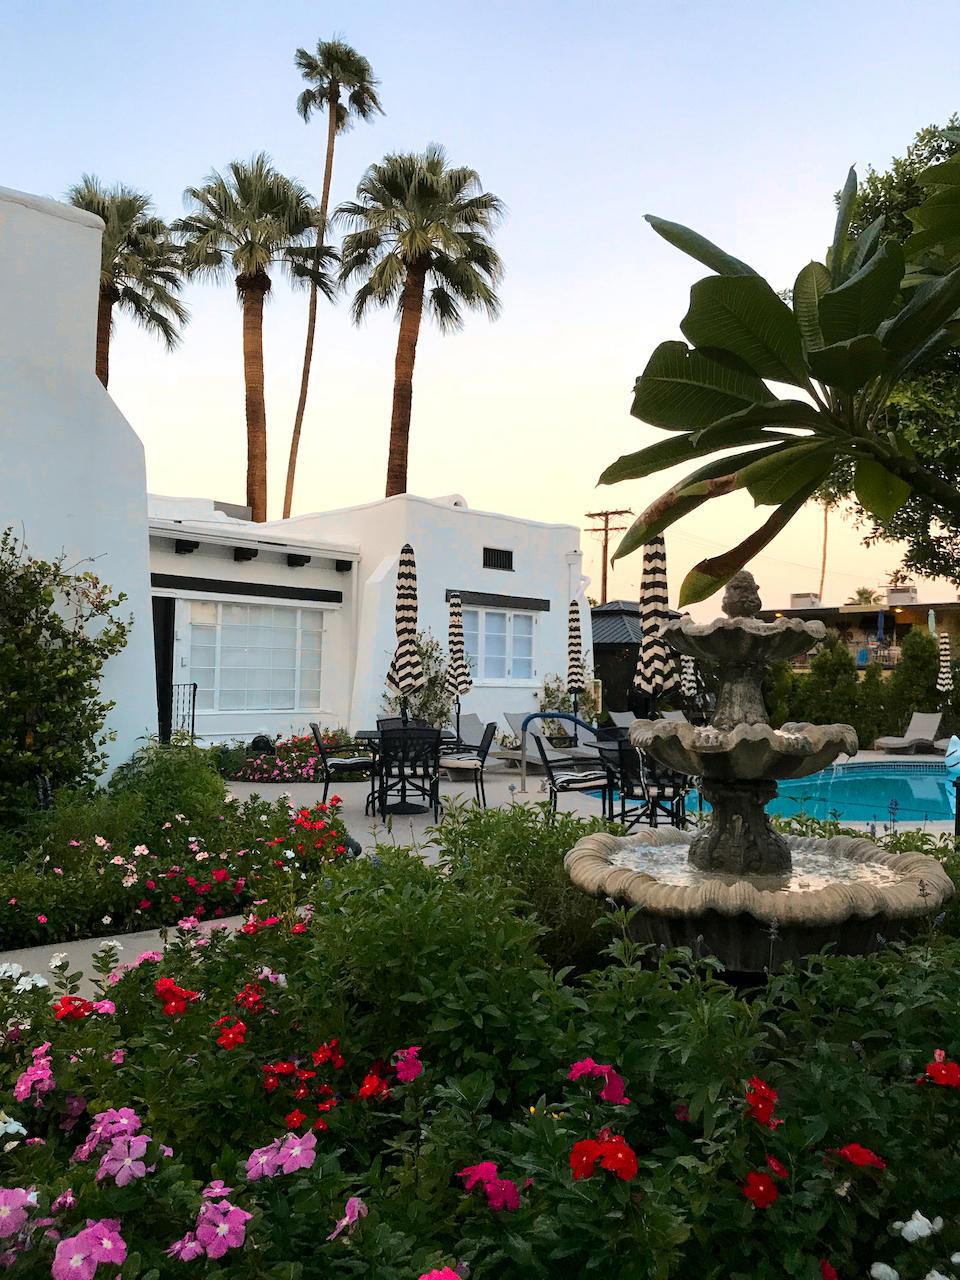 Amin Casa Palm Springs image 2